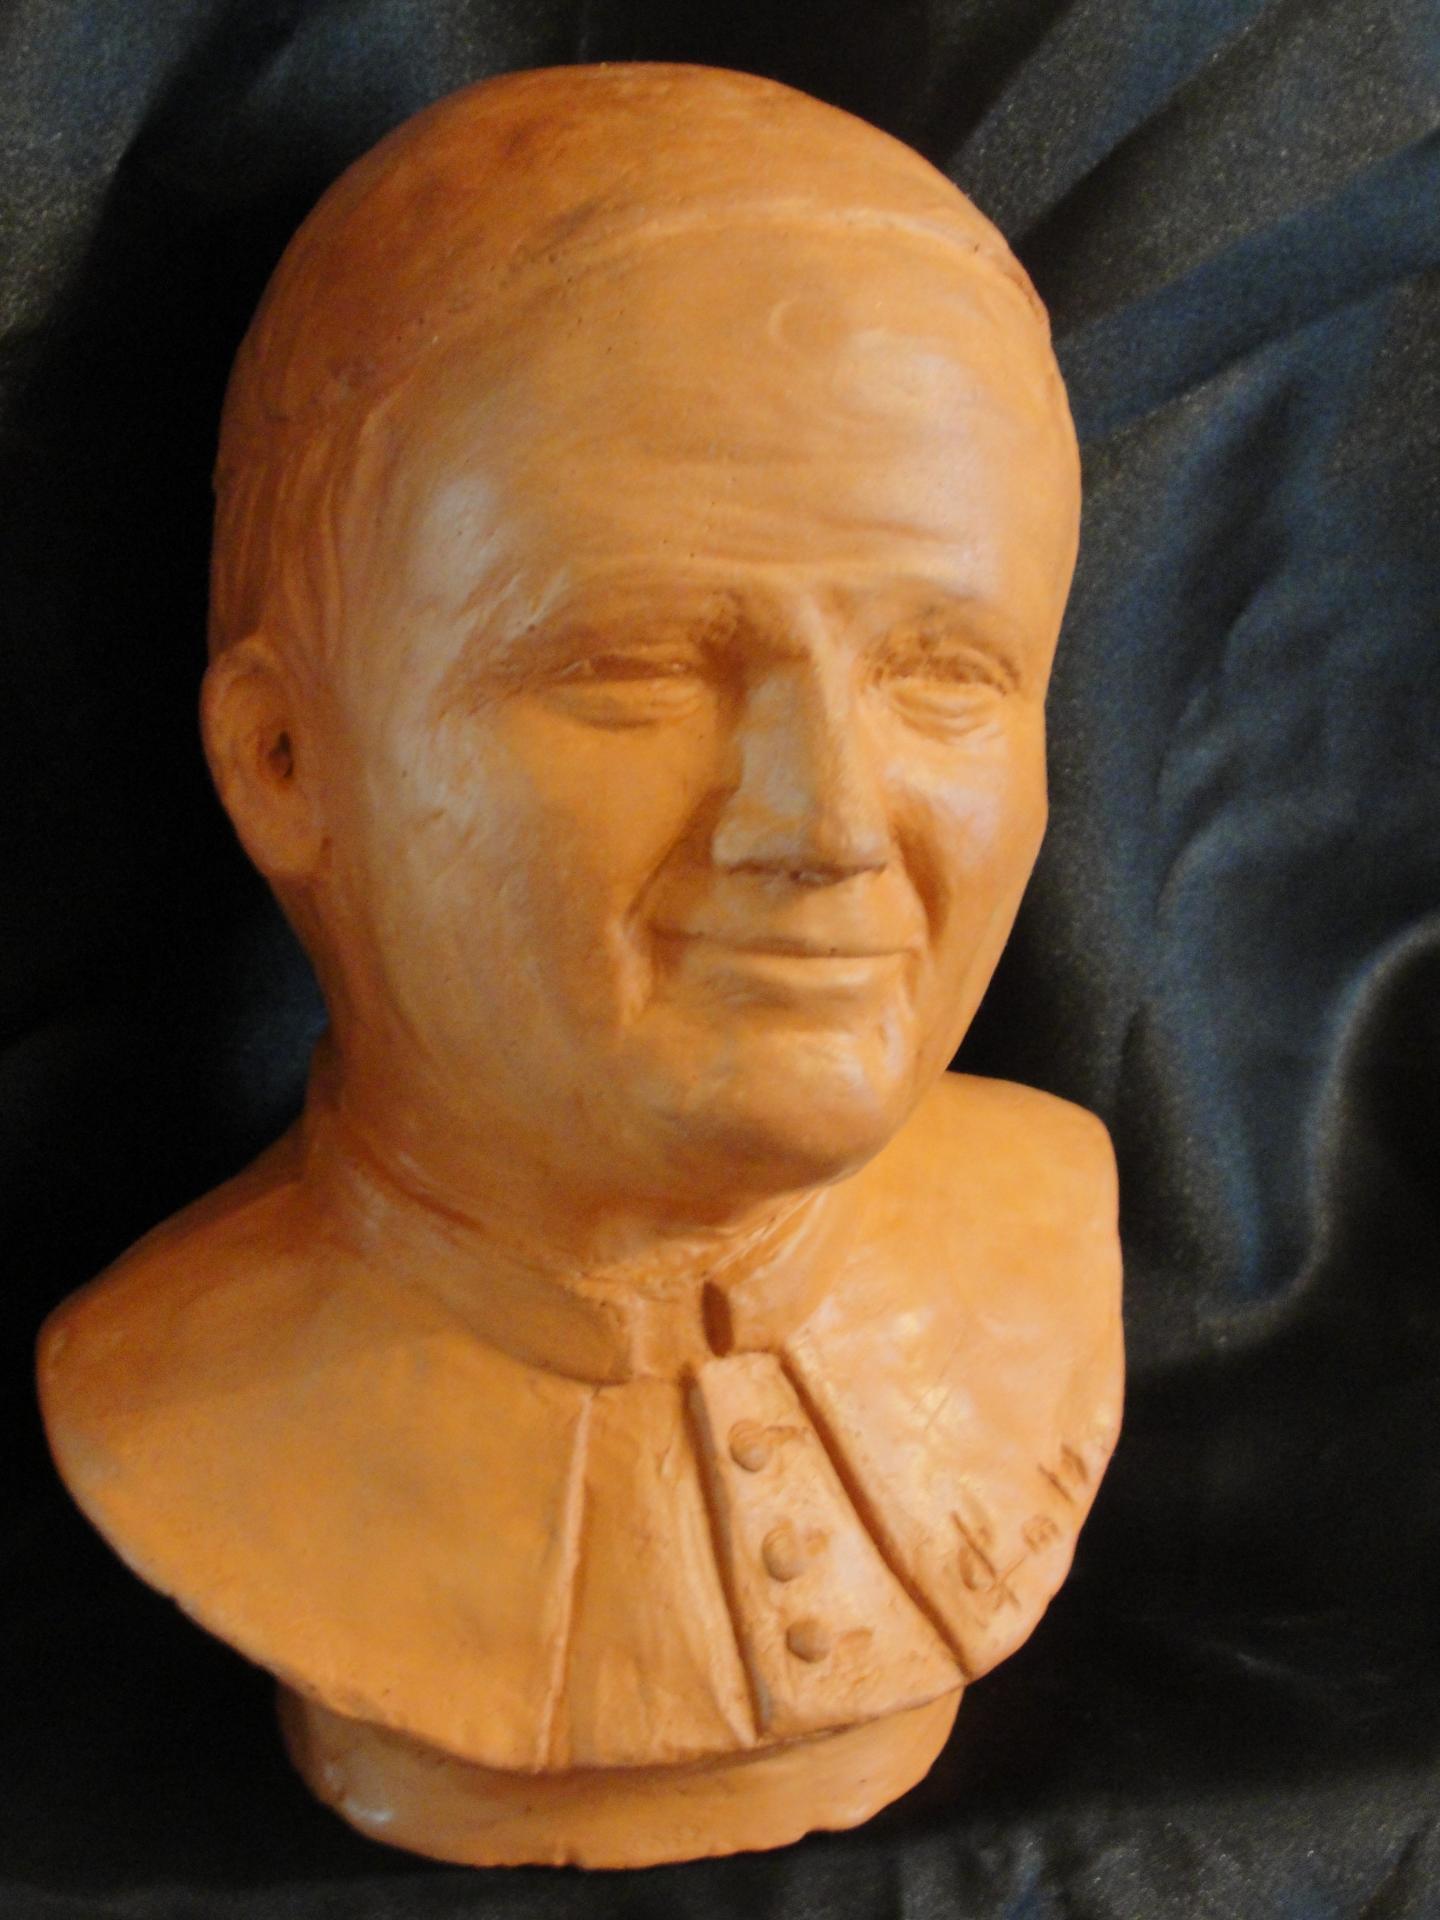 Sculpture sur terre, buste portrait de Jean-Paul II